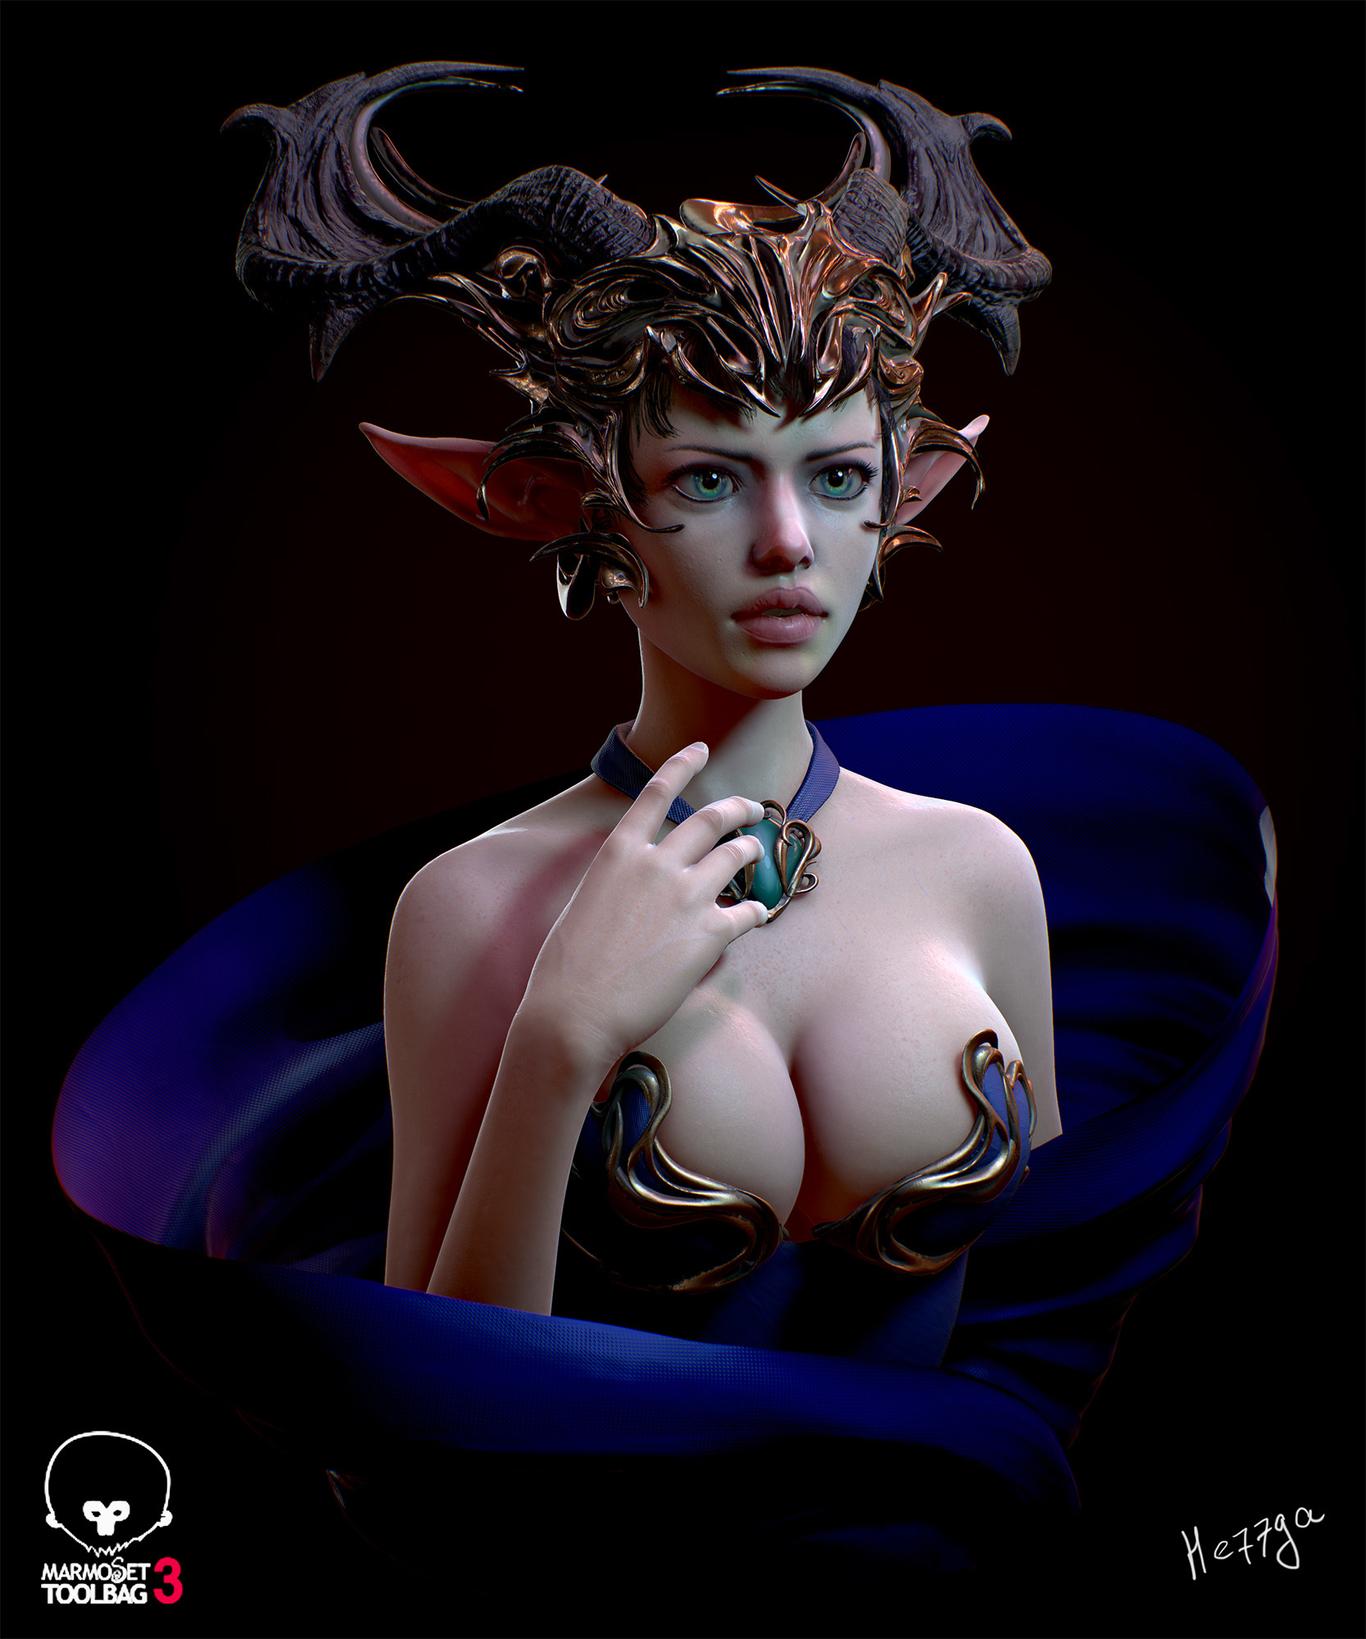 He77ga elf girl in blue 1 74502e84 w9x2